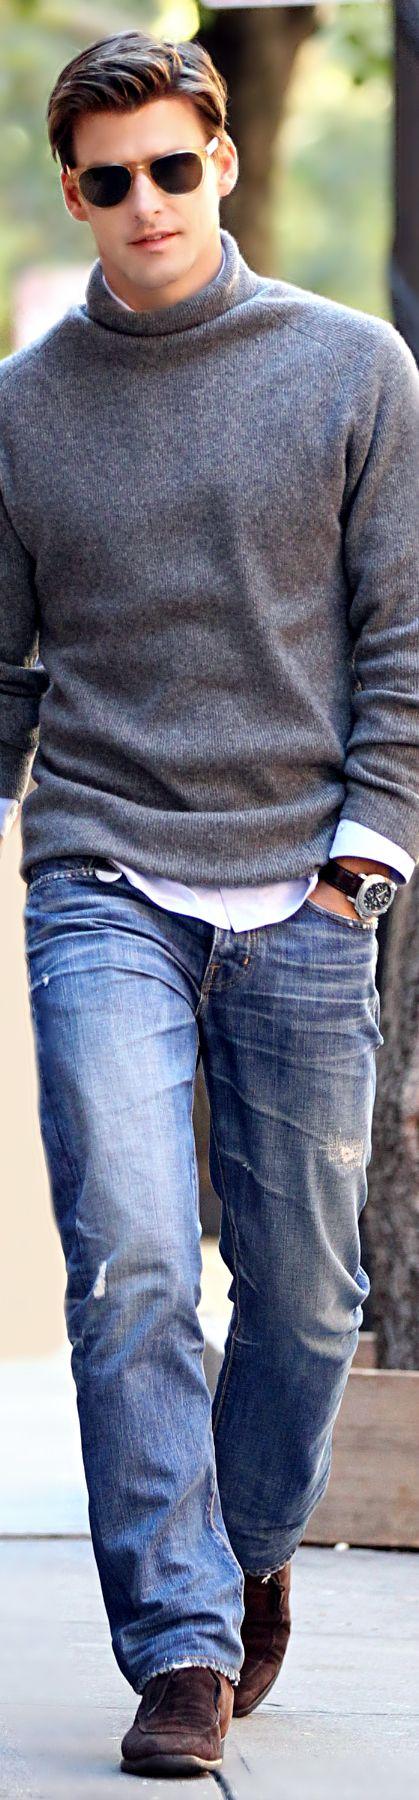 essay clothes maketh man